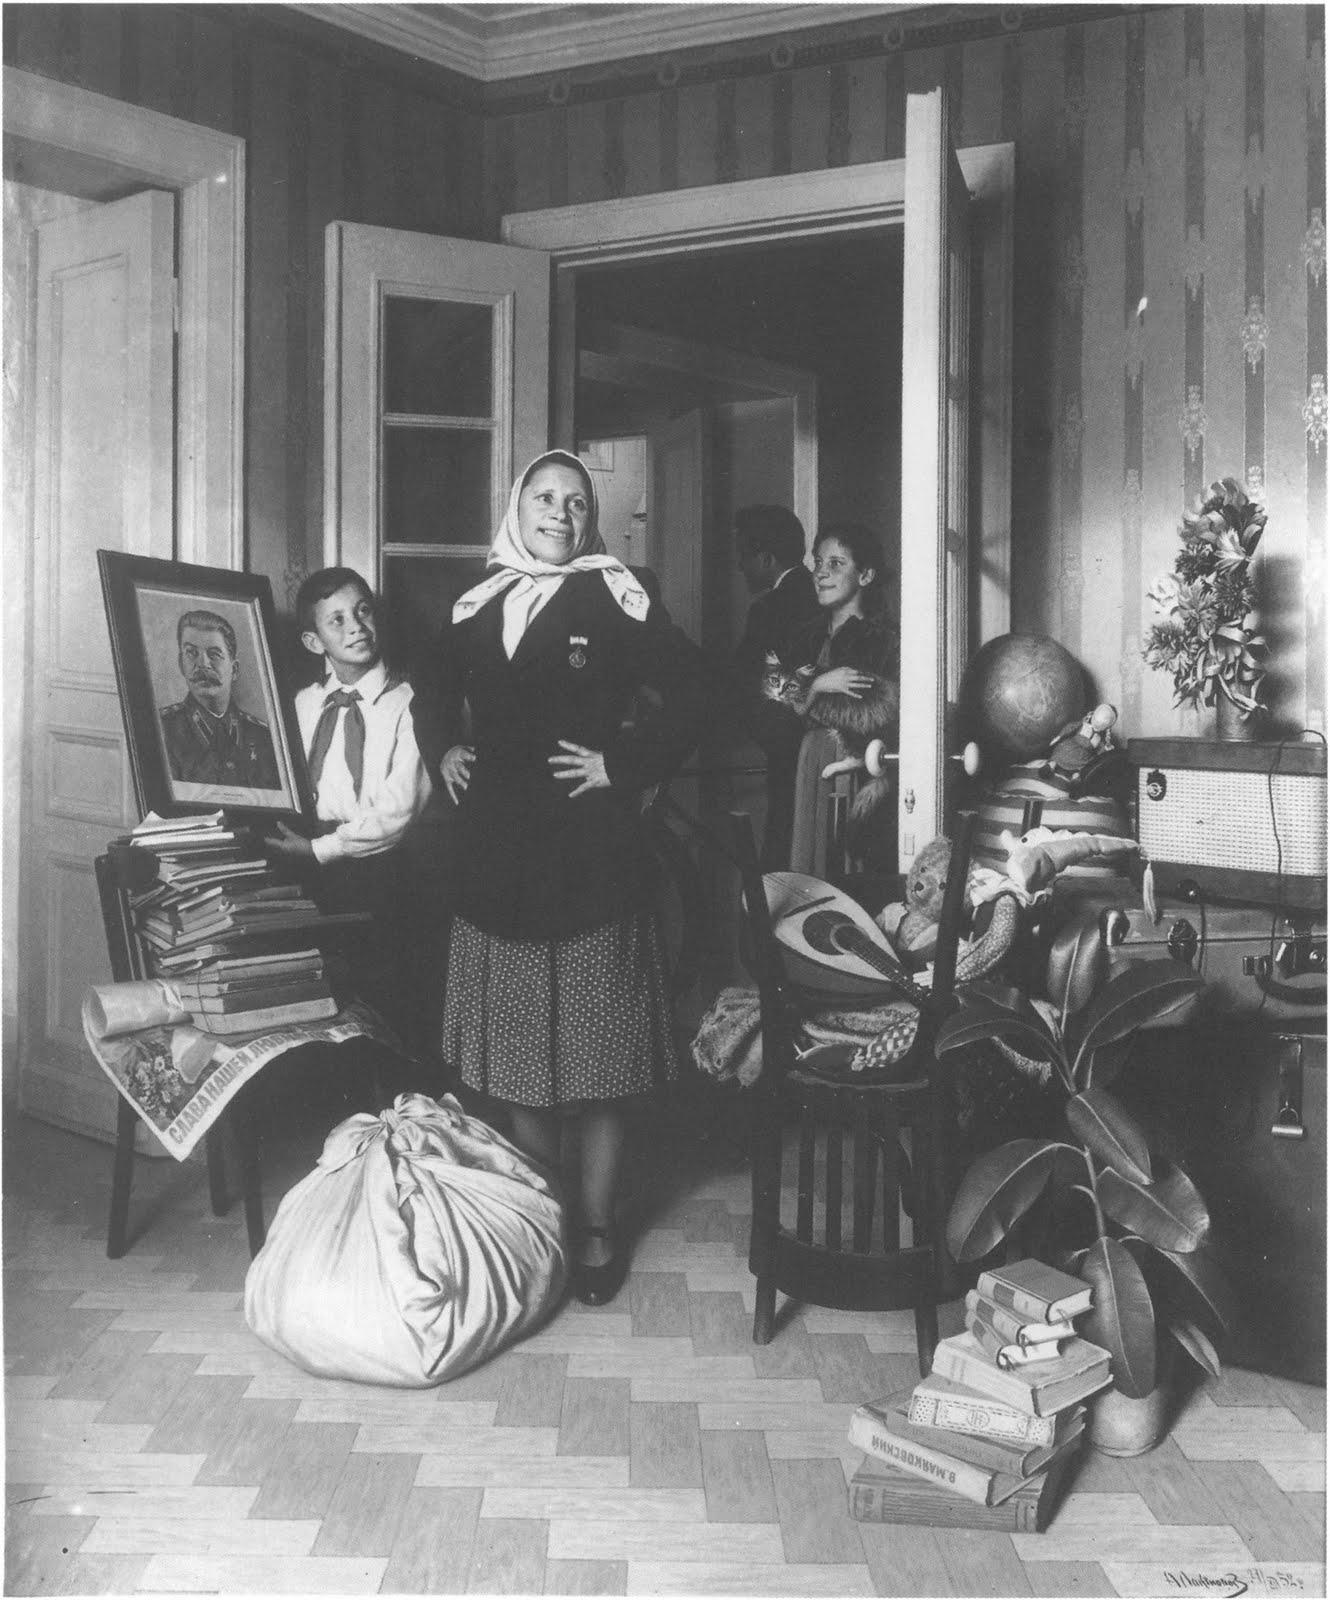 liam morrisey ma spud moving into a new apartment aleksander laktionov 1952. Black Bedroom Furniture Sets. Home Design Ideas